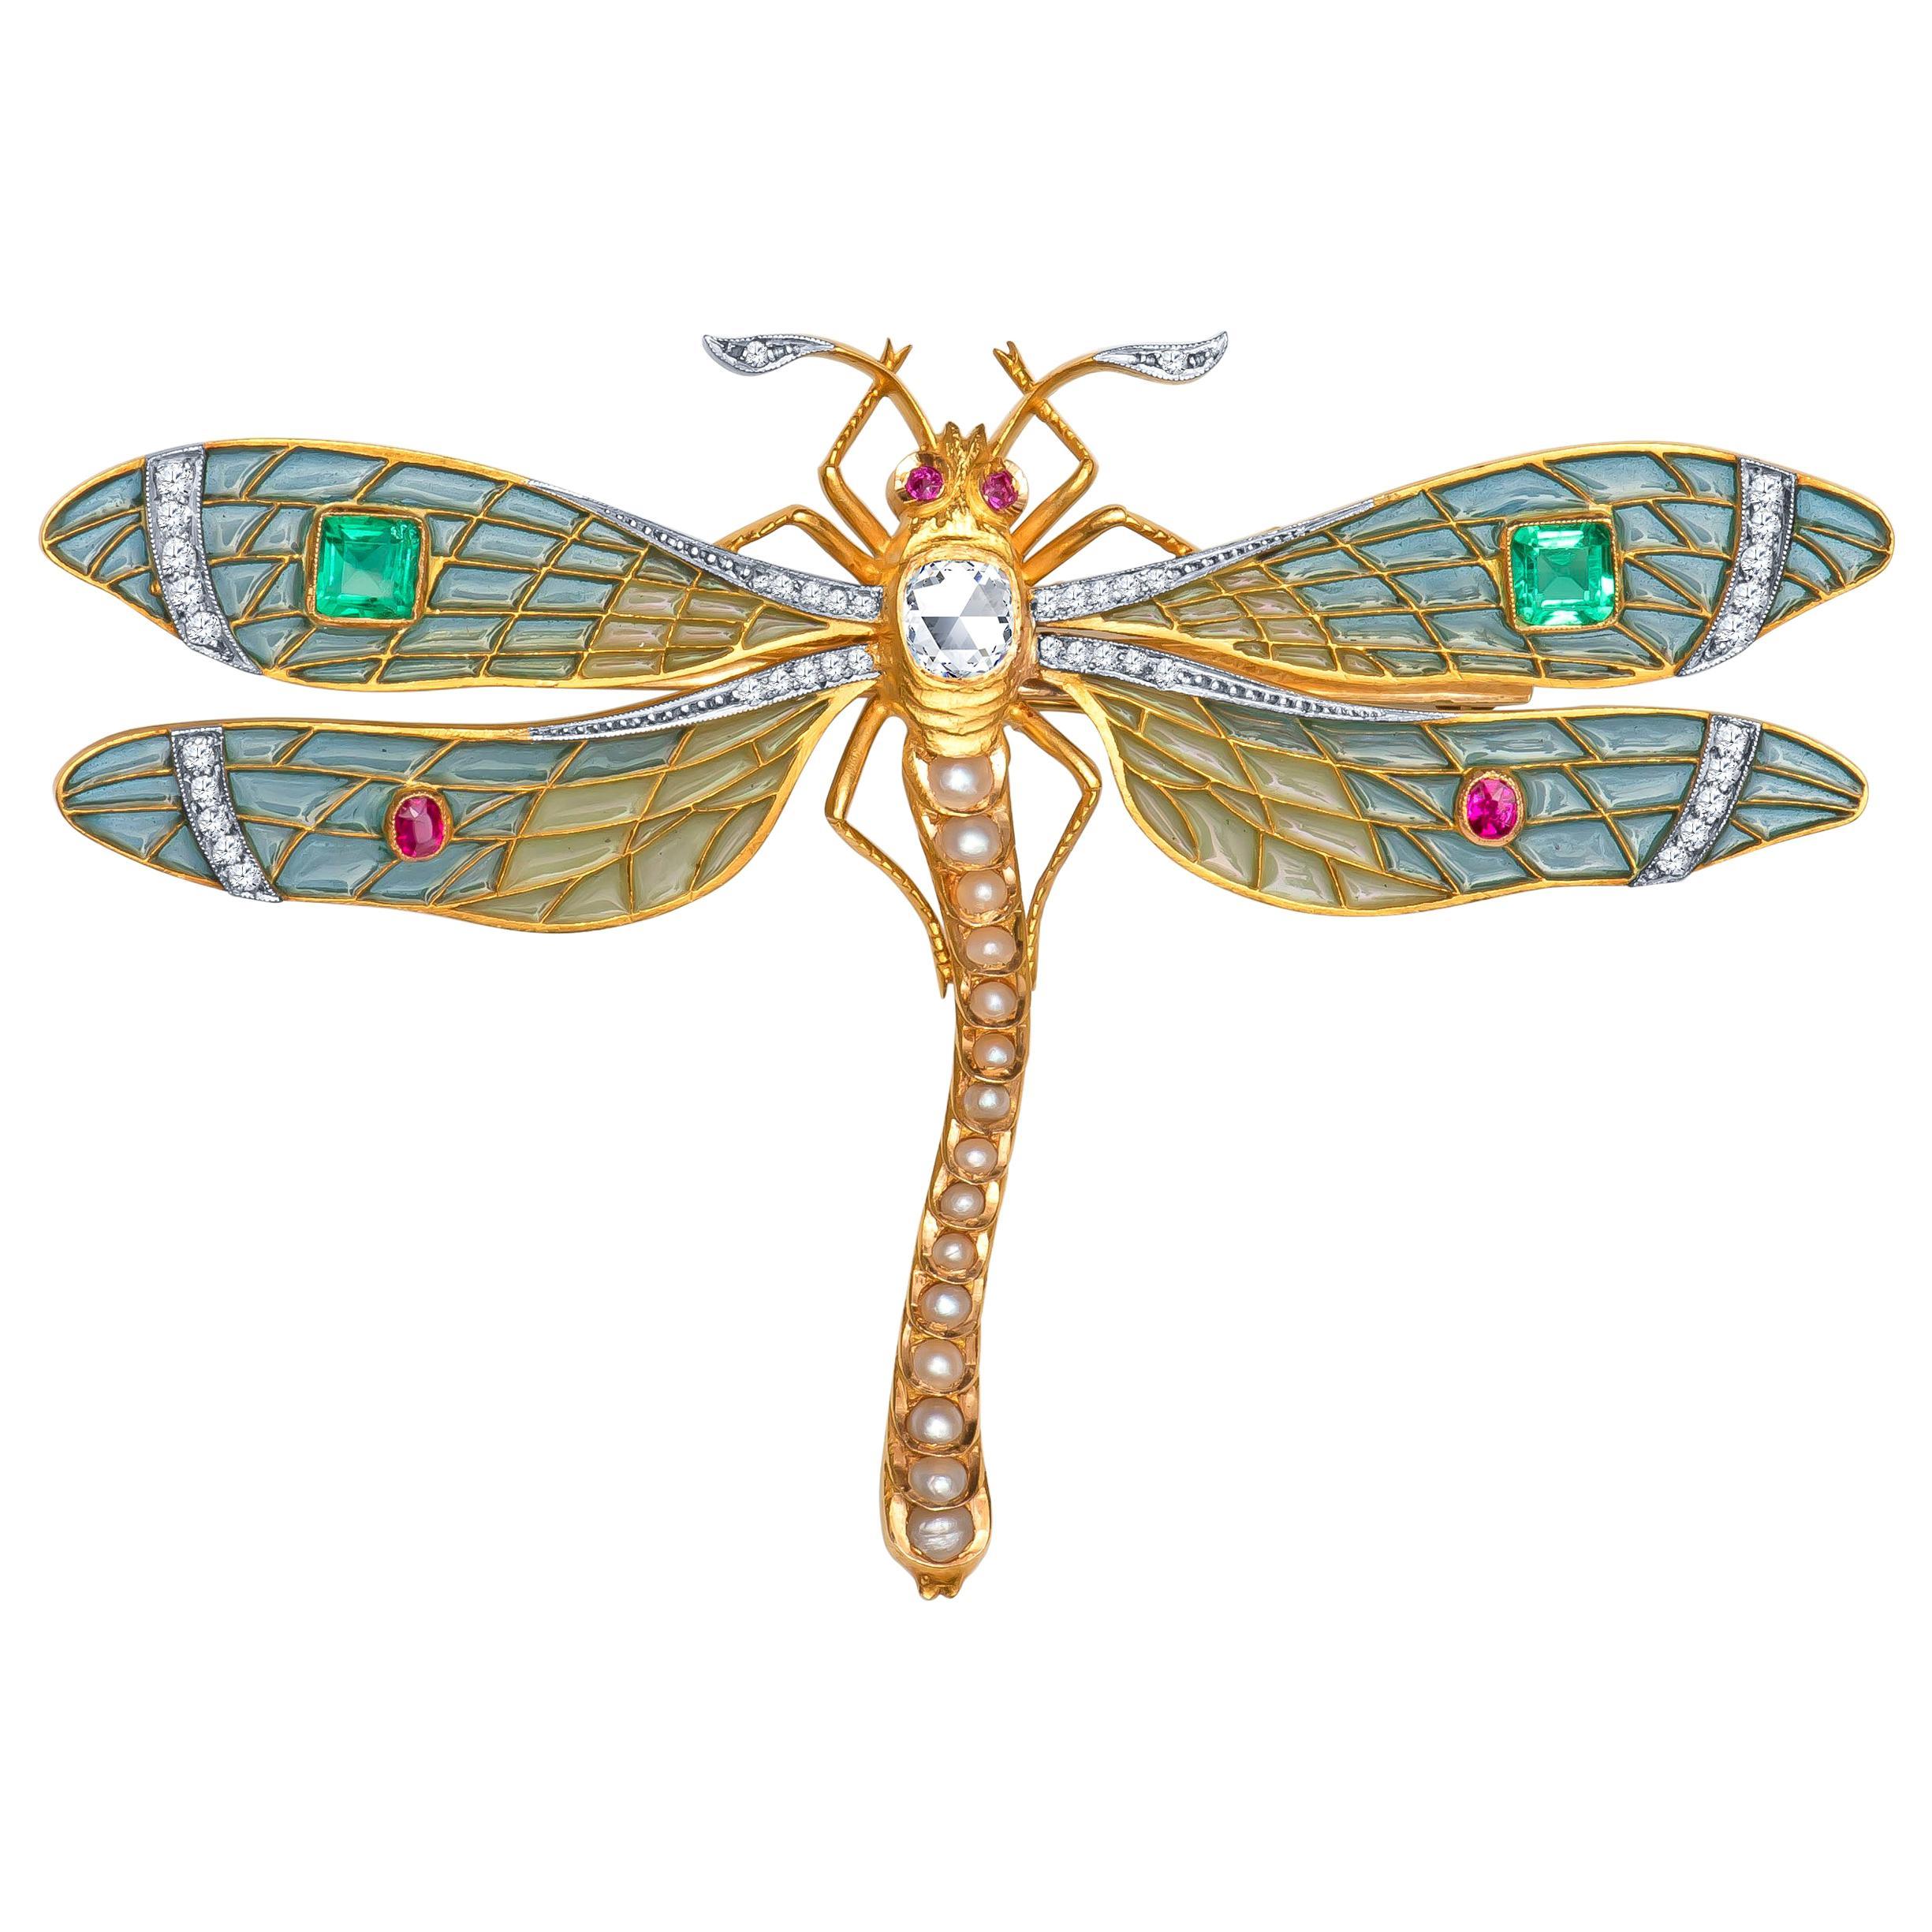 Antique-Style Plique à Jour Dragonfly Brooch, 0.90 Carat Old Miner Diamond, Gems